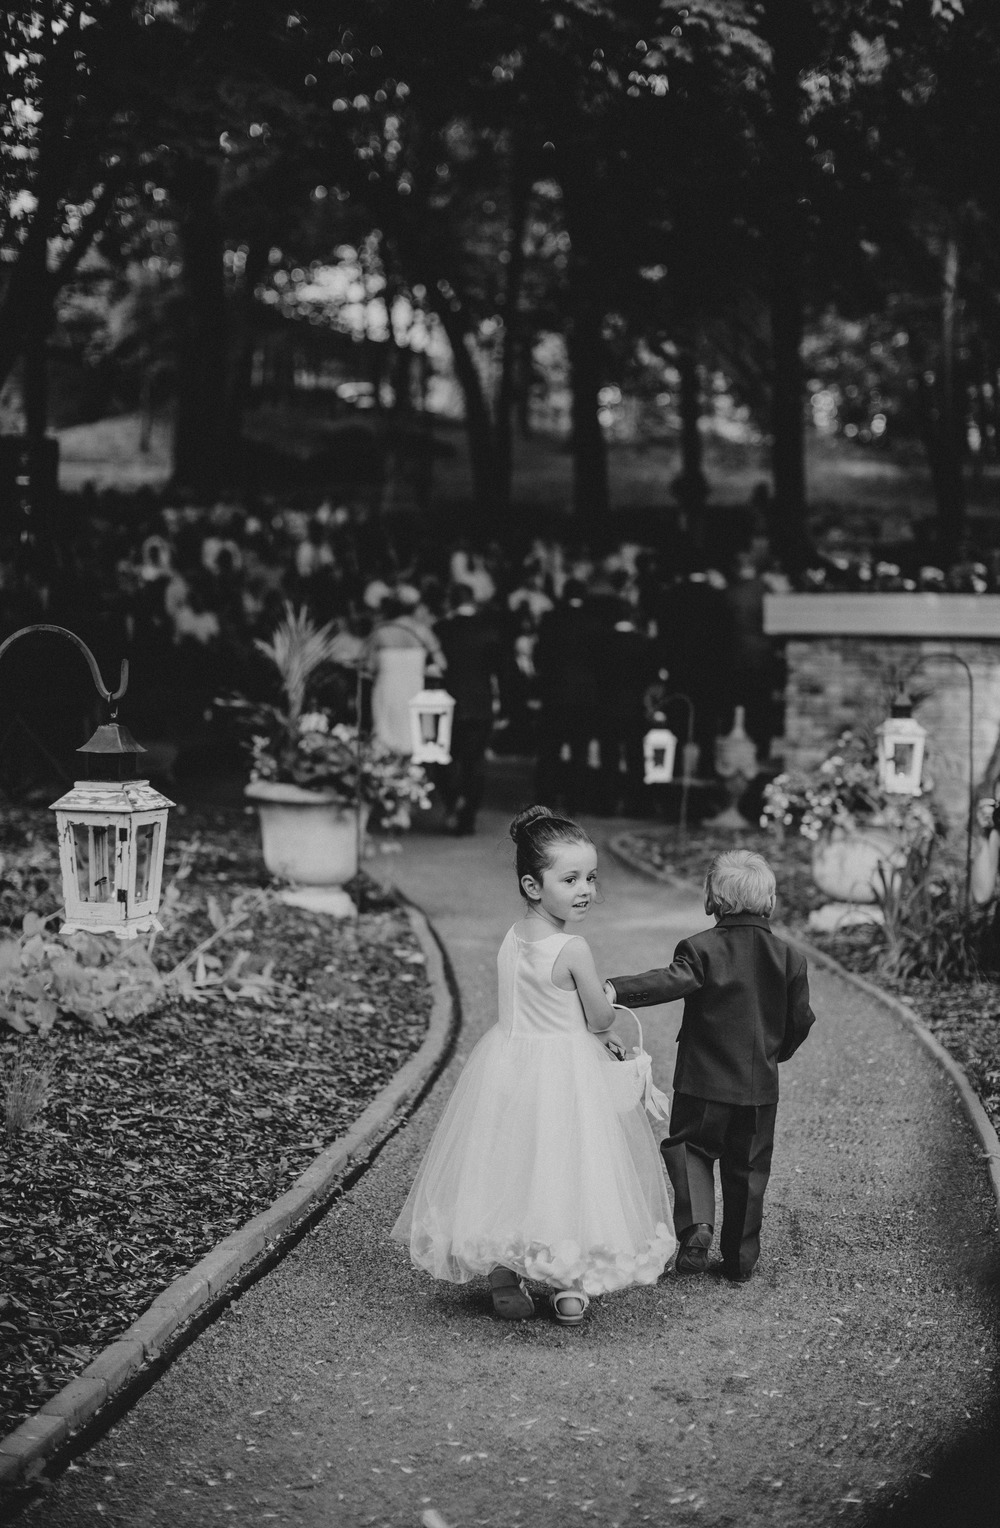 Lindsay+Lance_WeddingPreview_WoodsChapel_RussellHeeterPhotography-53.jpg